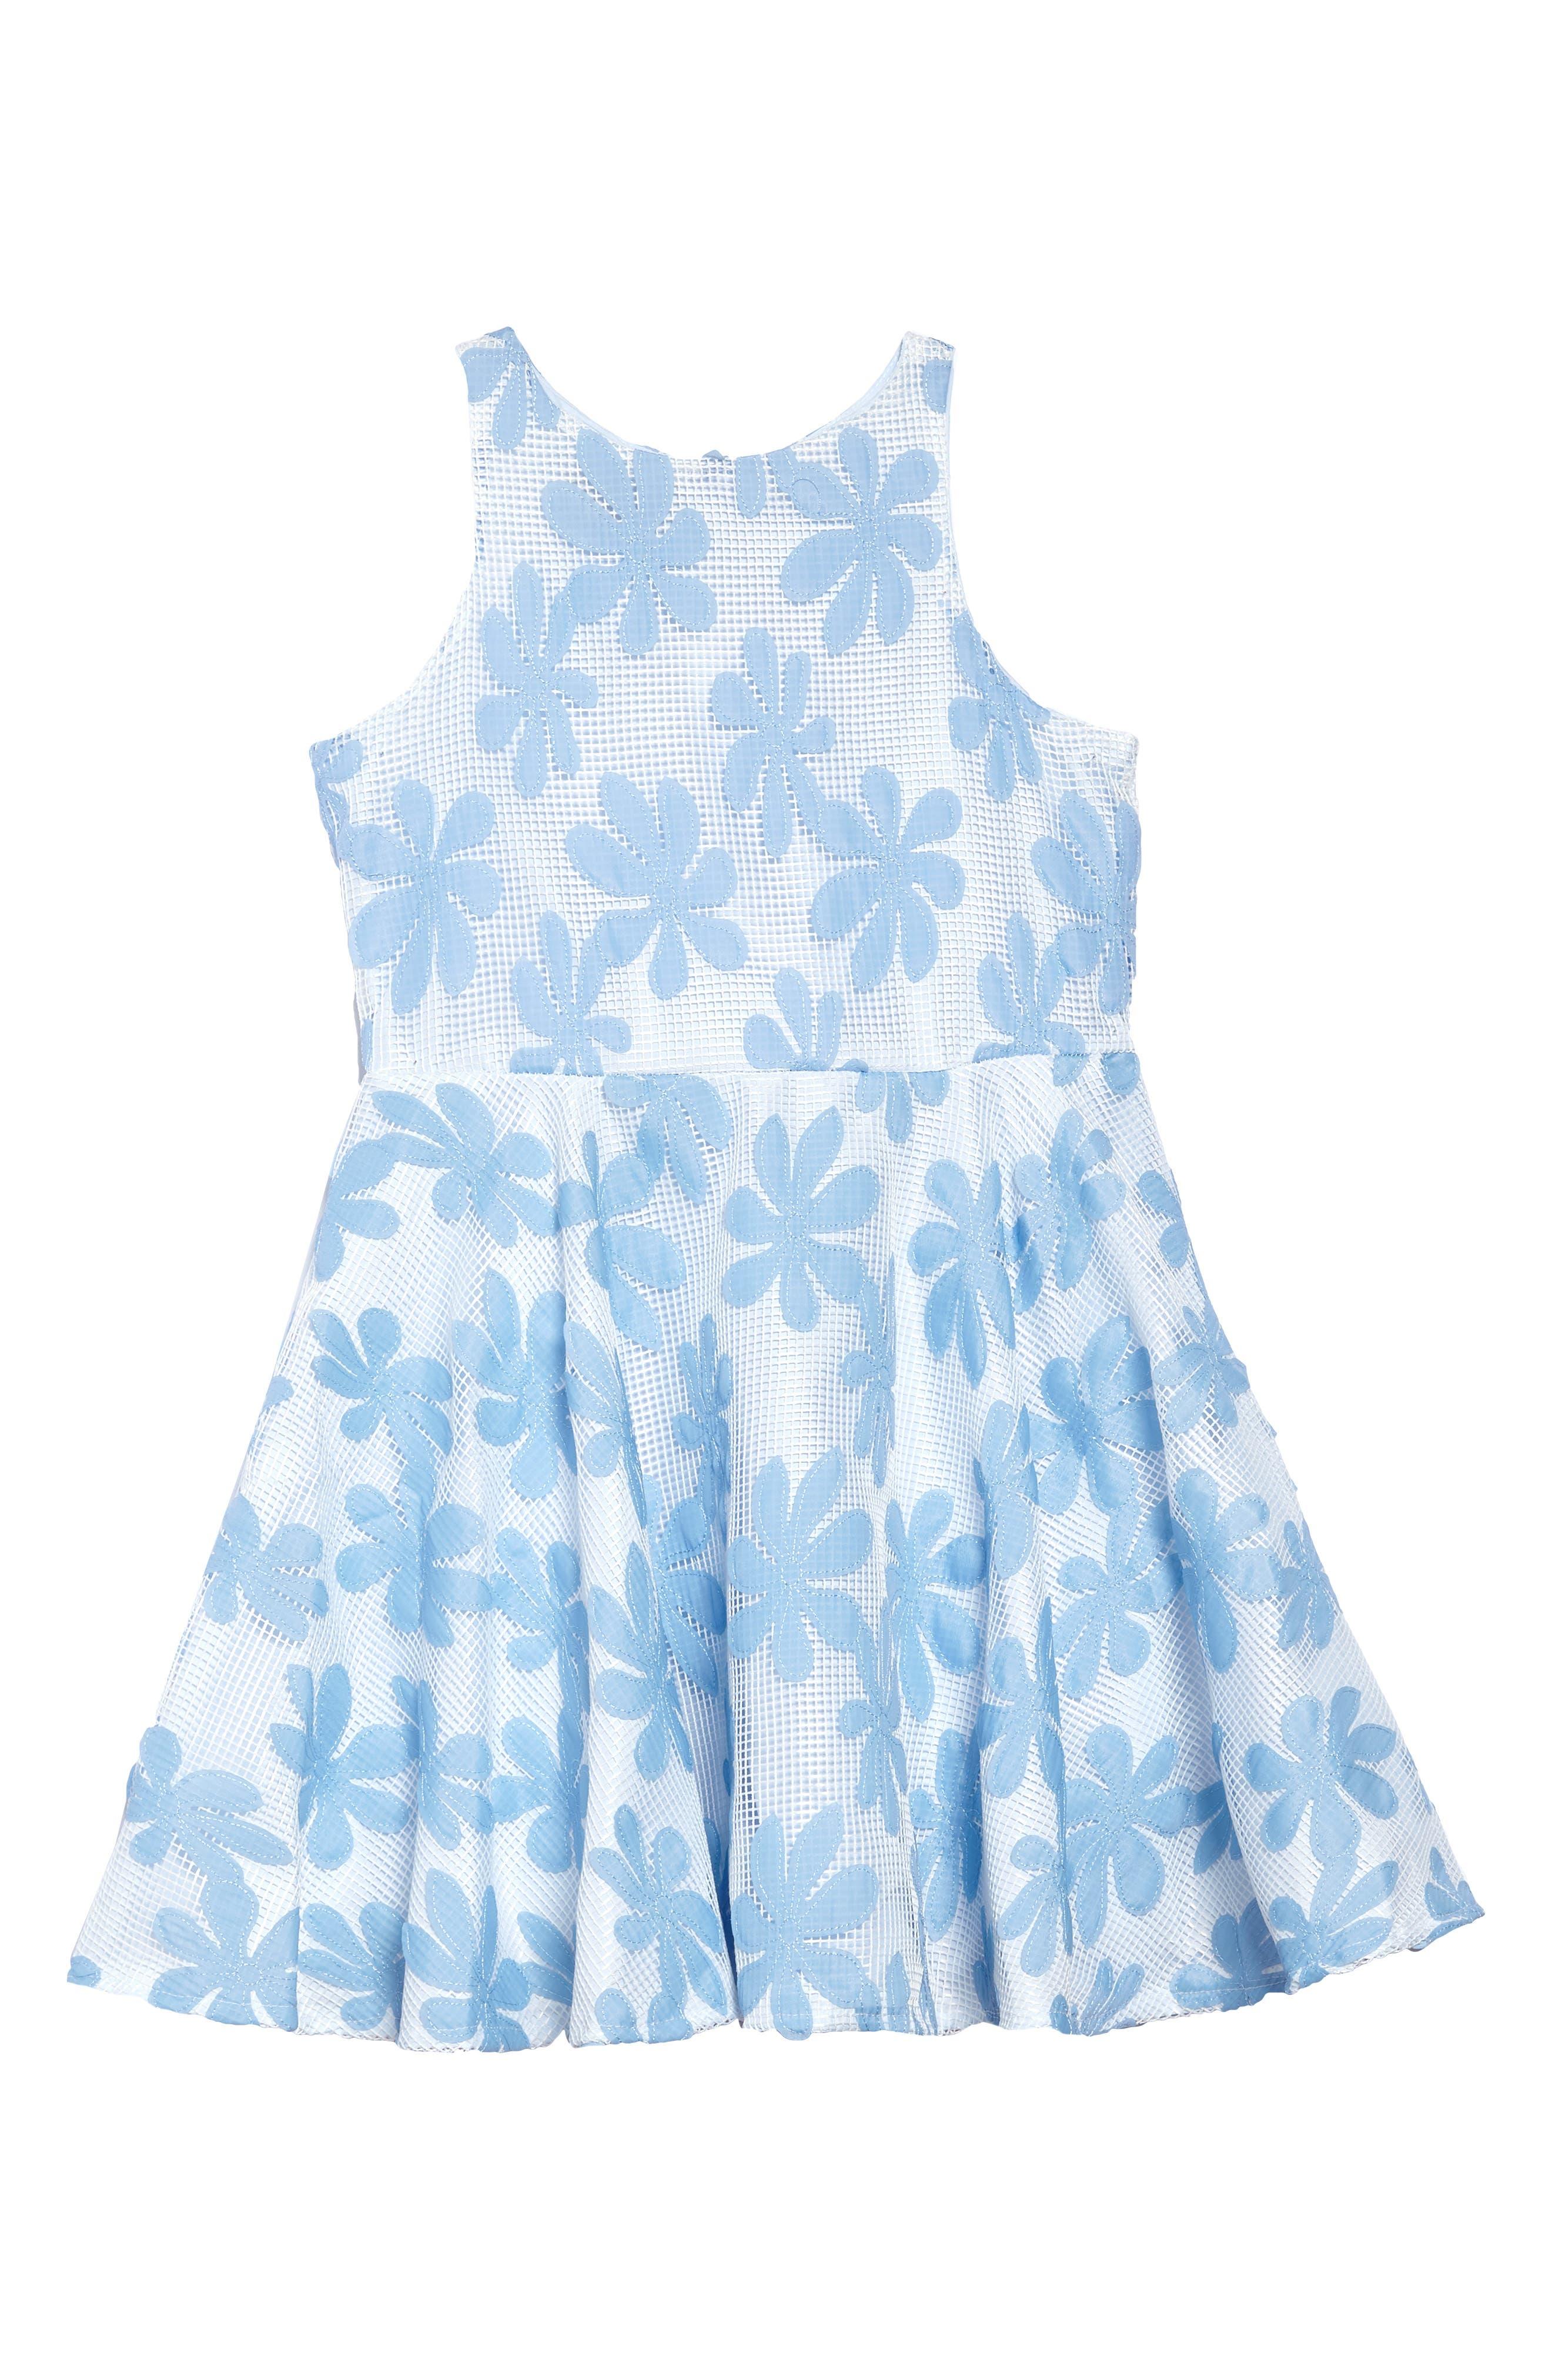 Main Image - Pippa & Julie Daisy Appliqué Mesh Dress (Baby Girls & Big Girls)